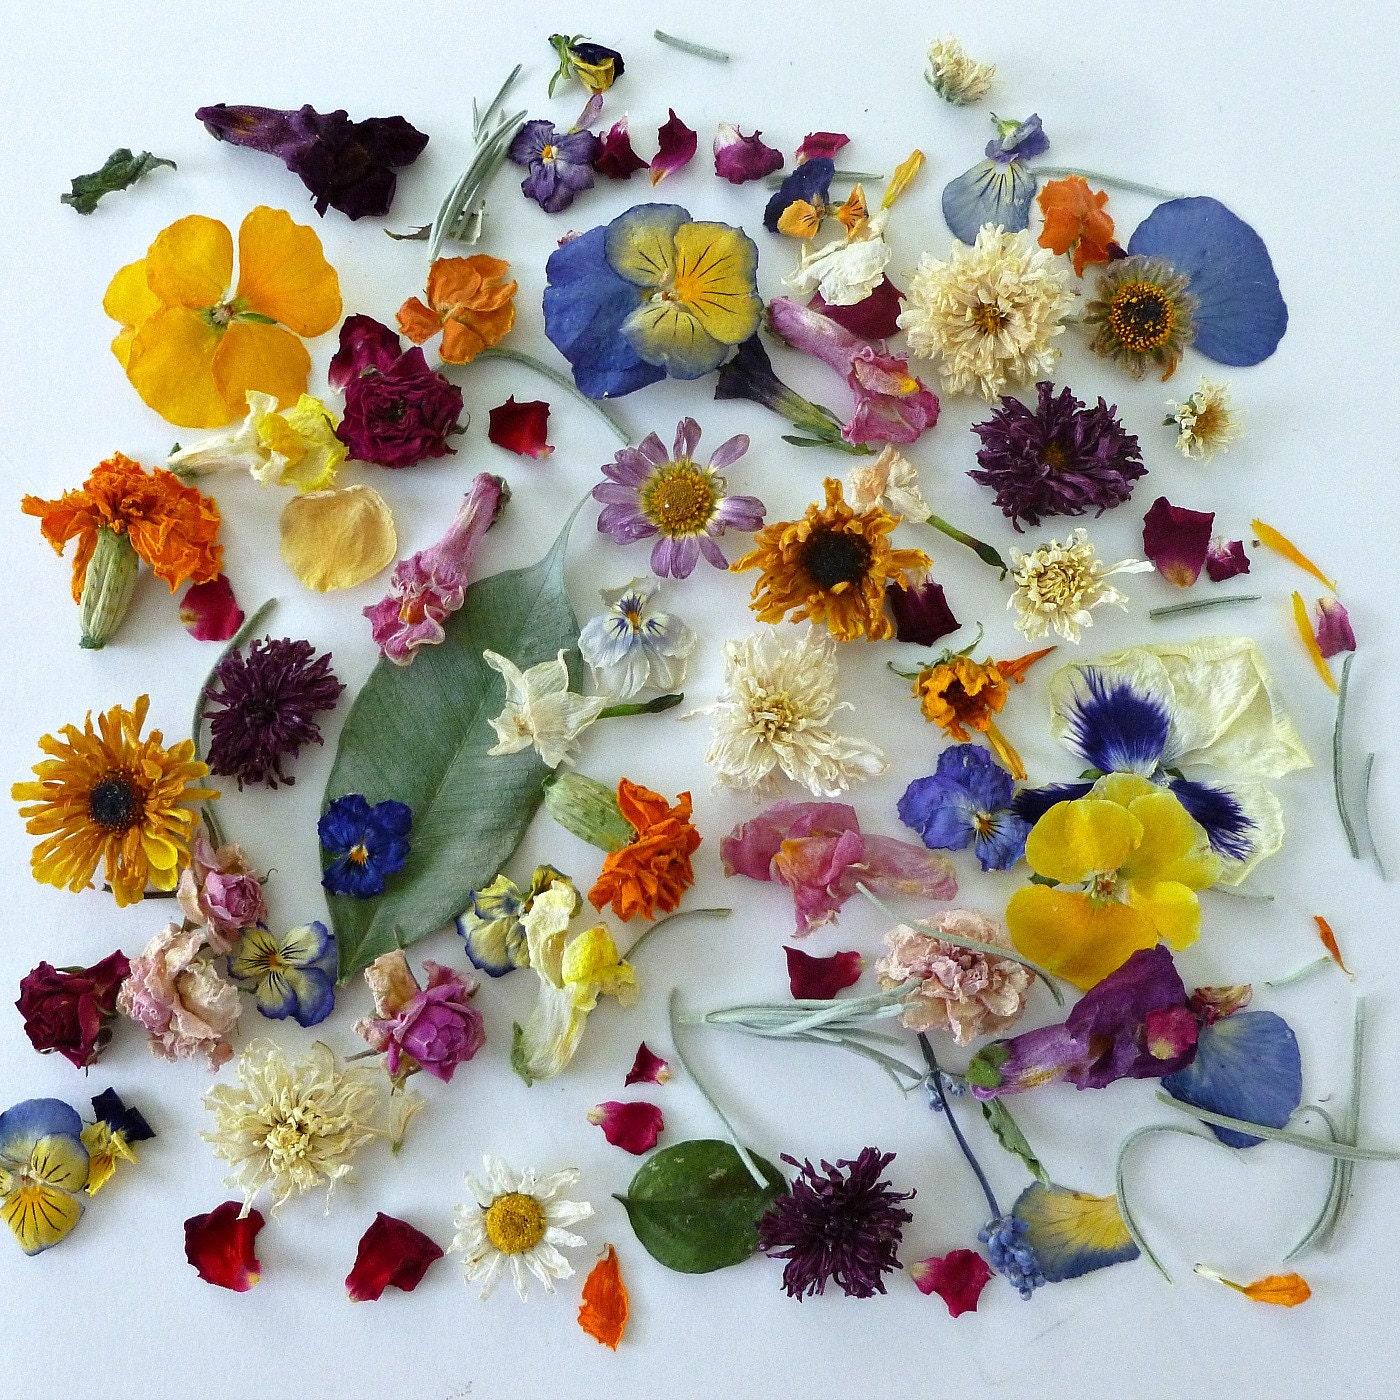 Flower Petals Wedding Confetti Dried Flowers By LarkspurHill